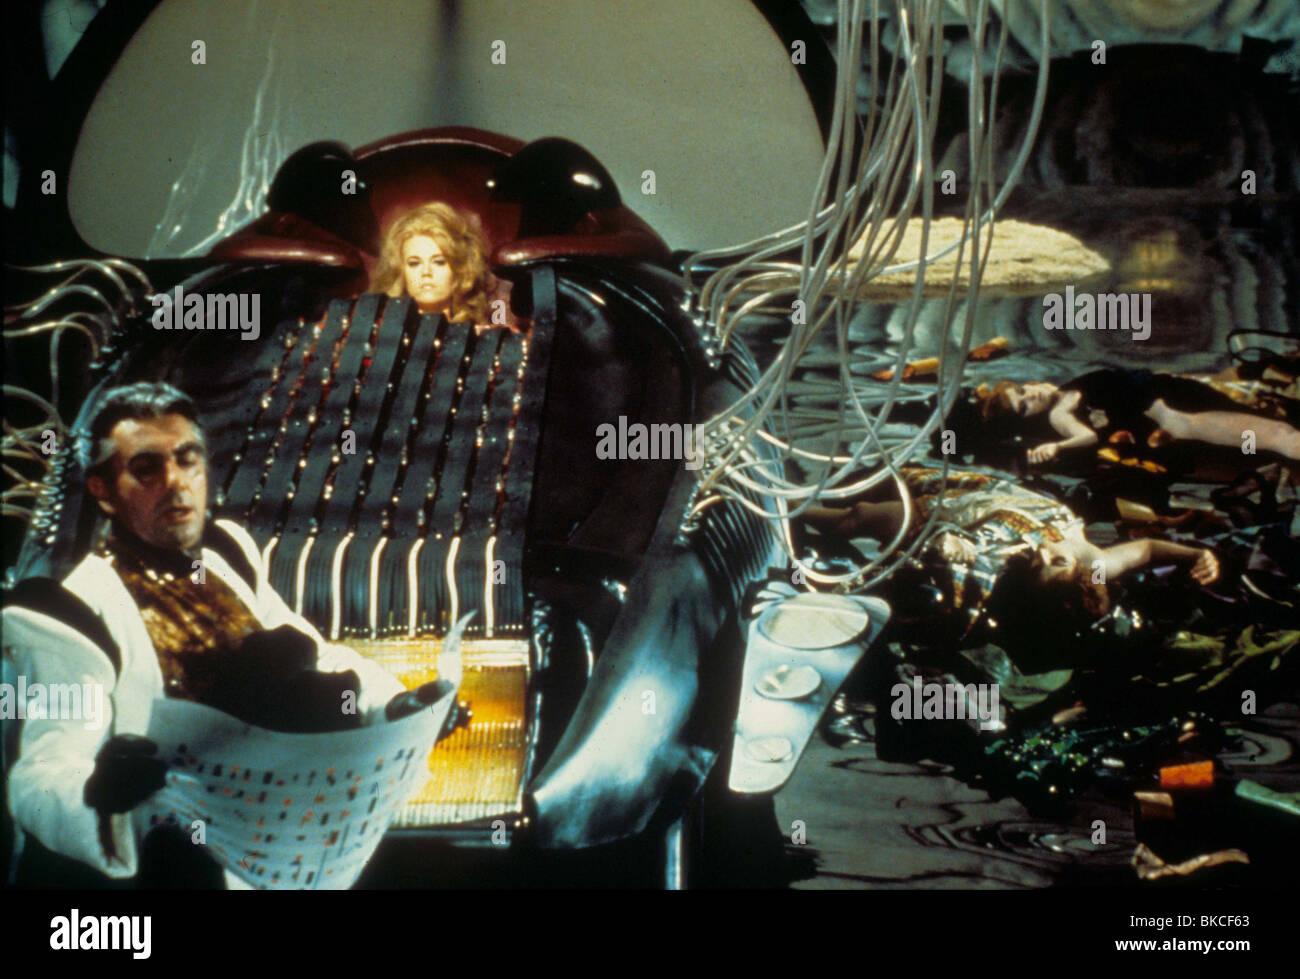 BARBARELLA (1967) MILO O'SHEA, DURAND DURAND, JANE FONDA, BARBARELLA BRB 004 - Stock Image